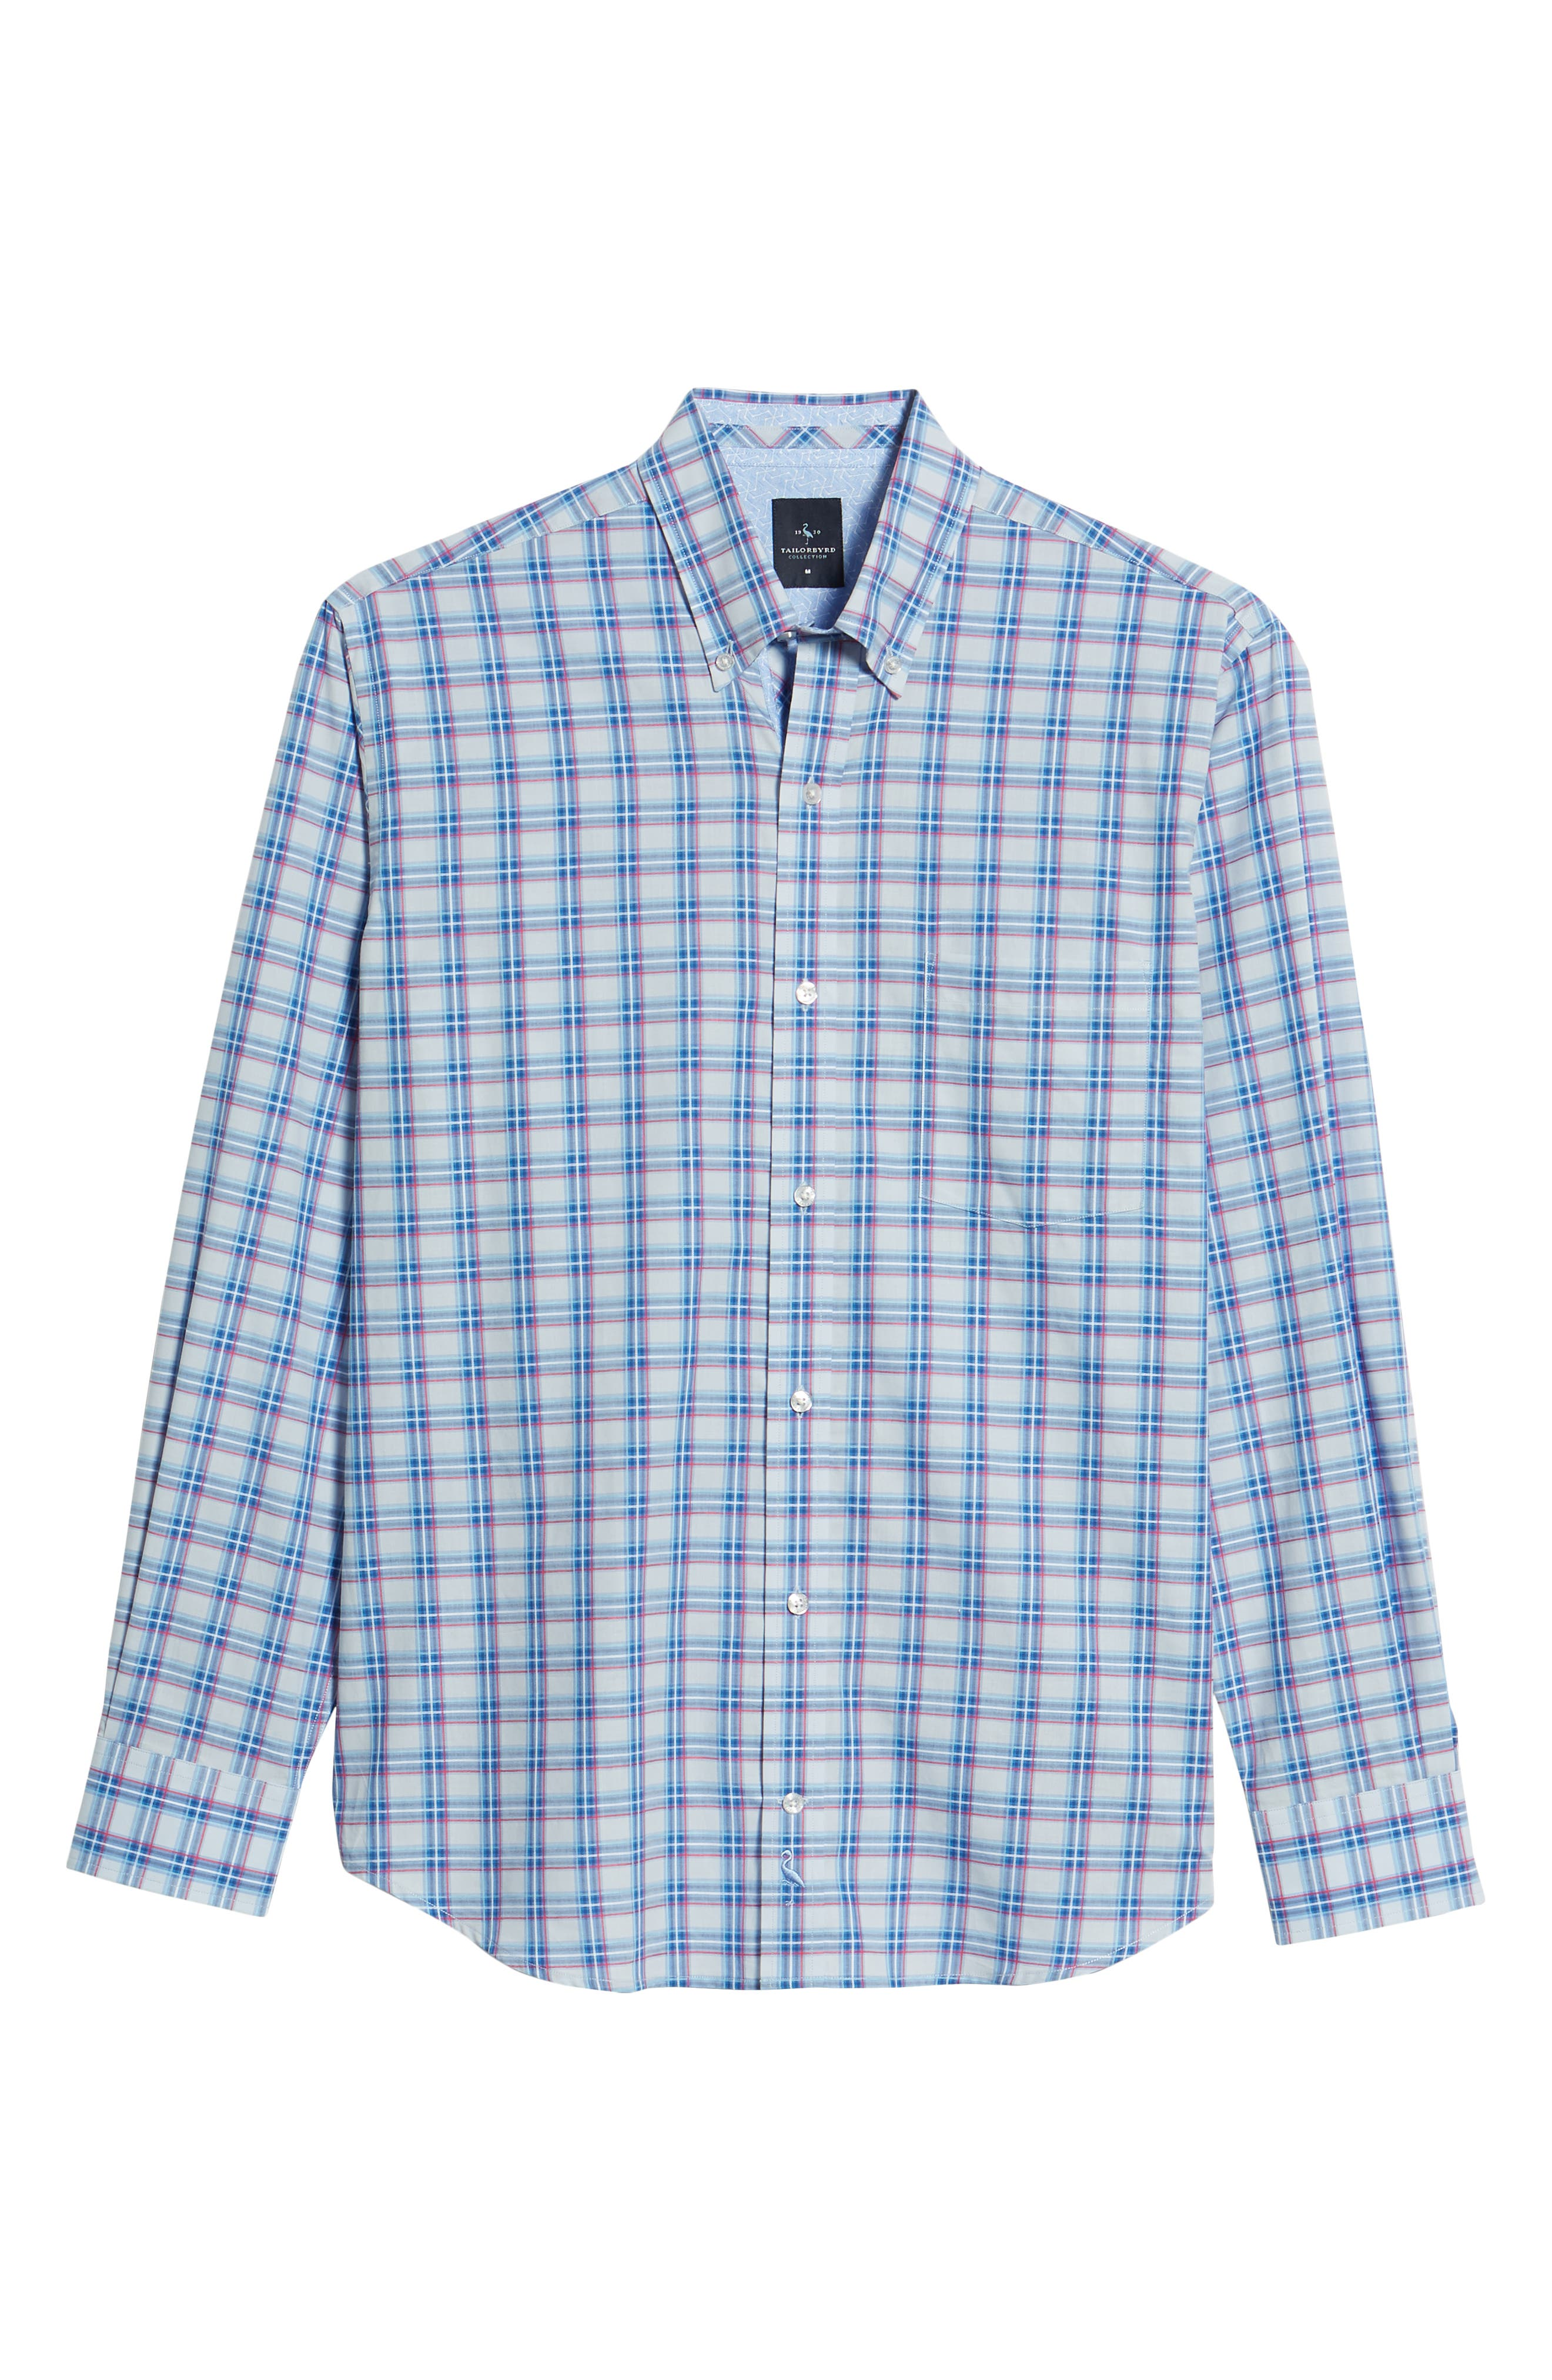 Alvaro Regular Fit Plaid Sport Shirt,                             Alternate thumbnail 6, color,                             Light Blue